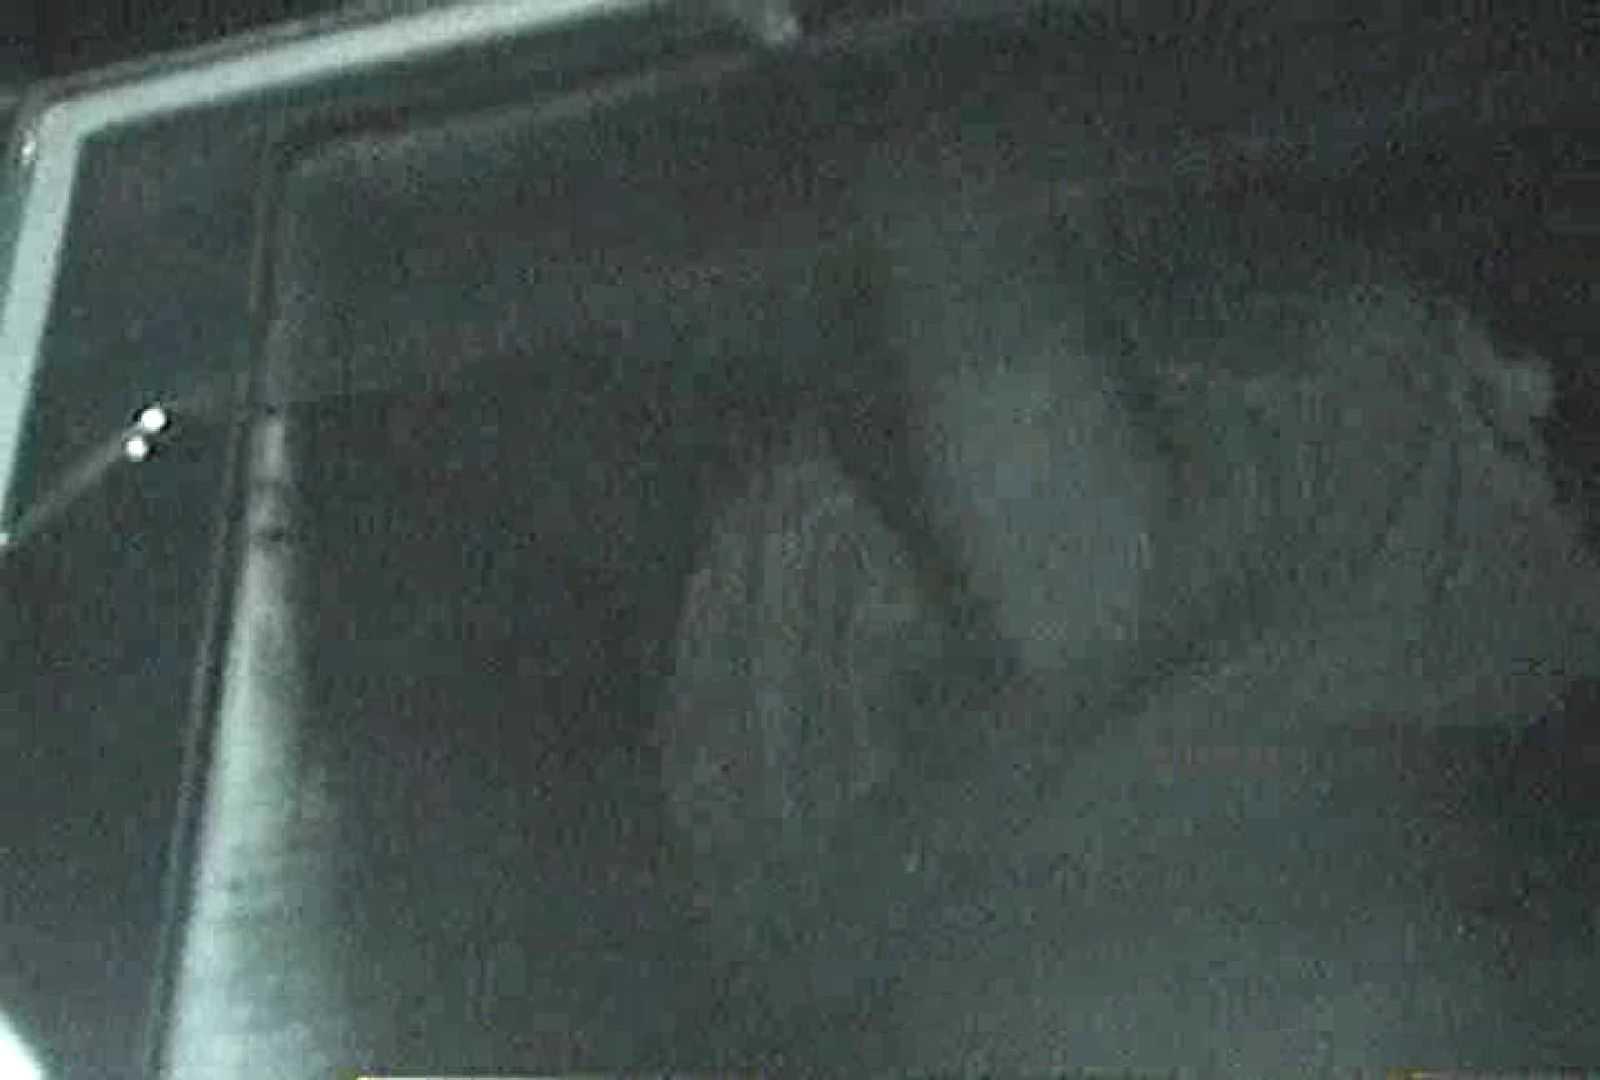 充血監督の深夜の運動会Vol.48 淫乱 スケベ動画紹介 63連発 52